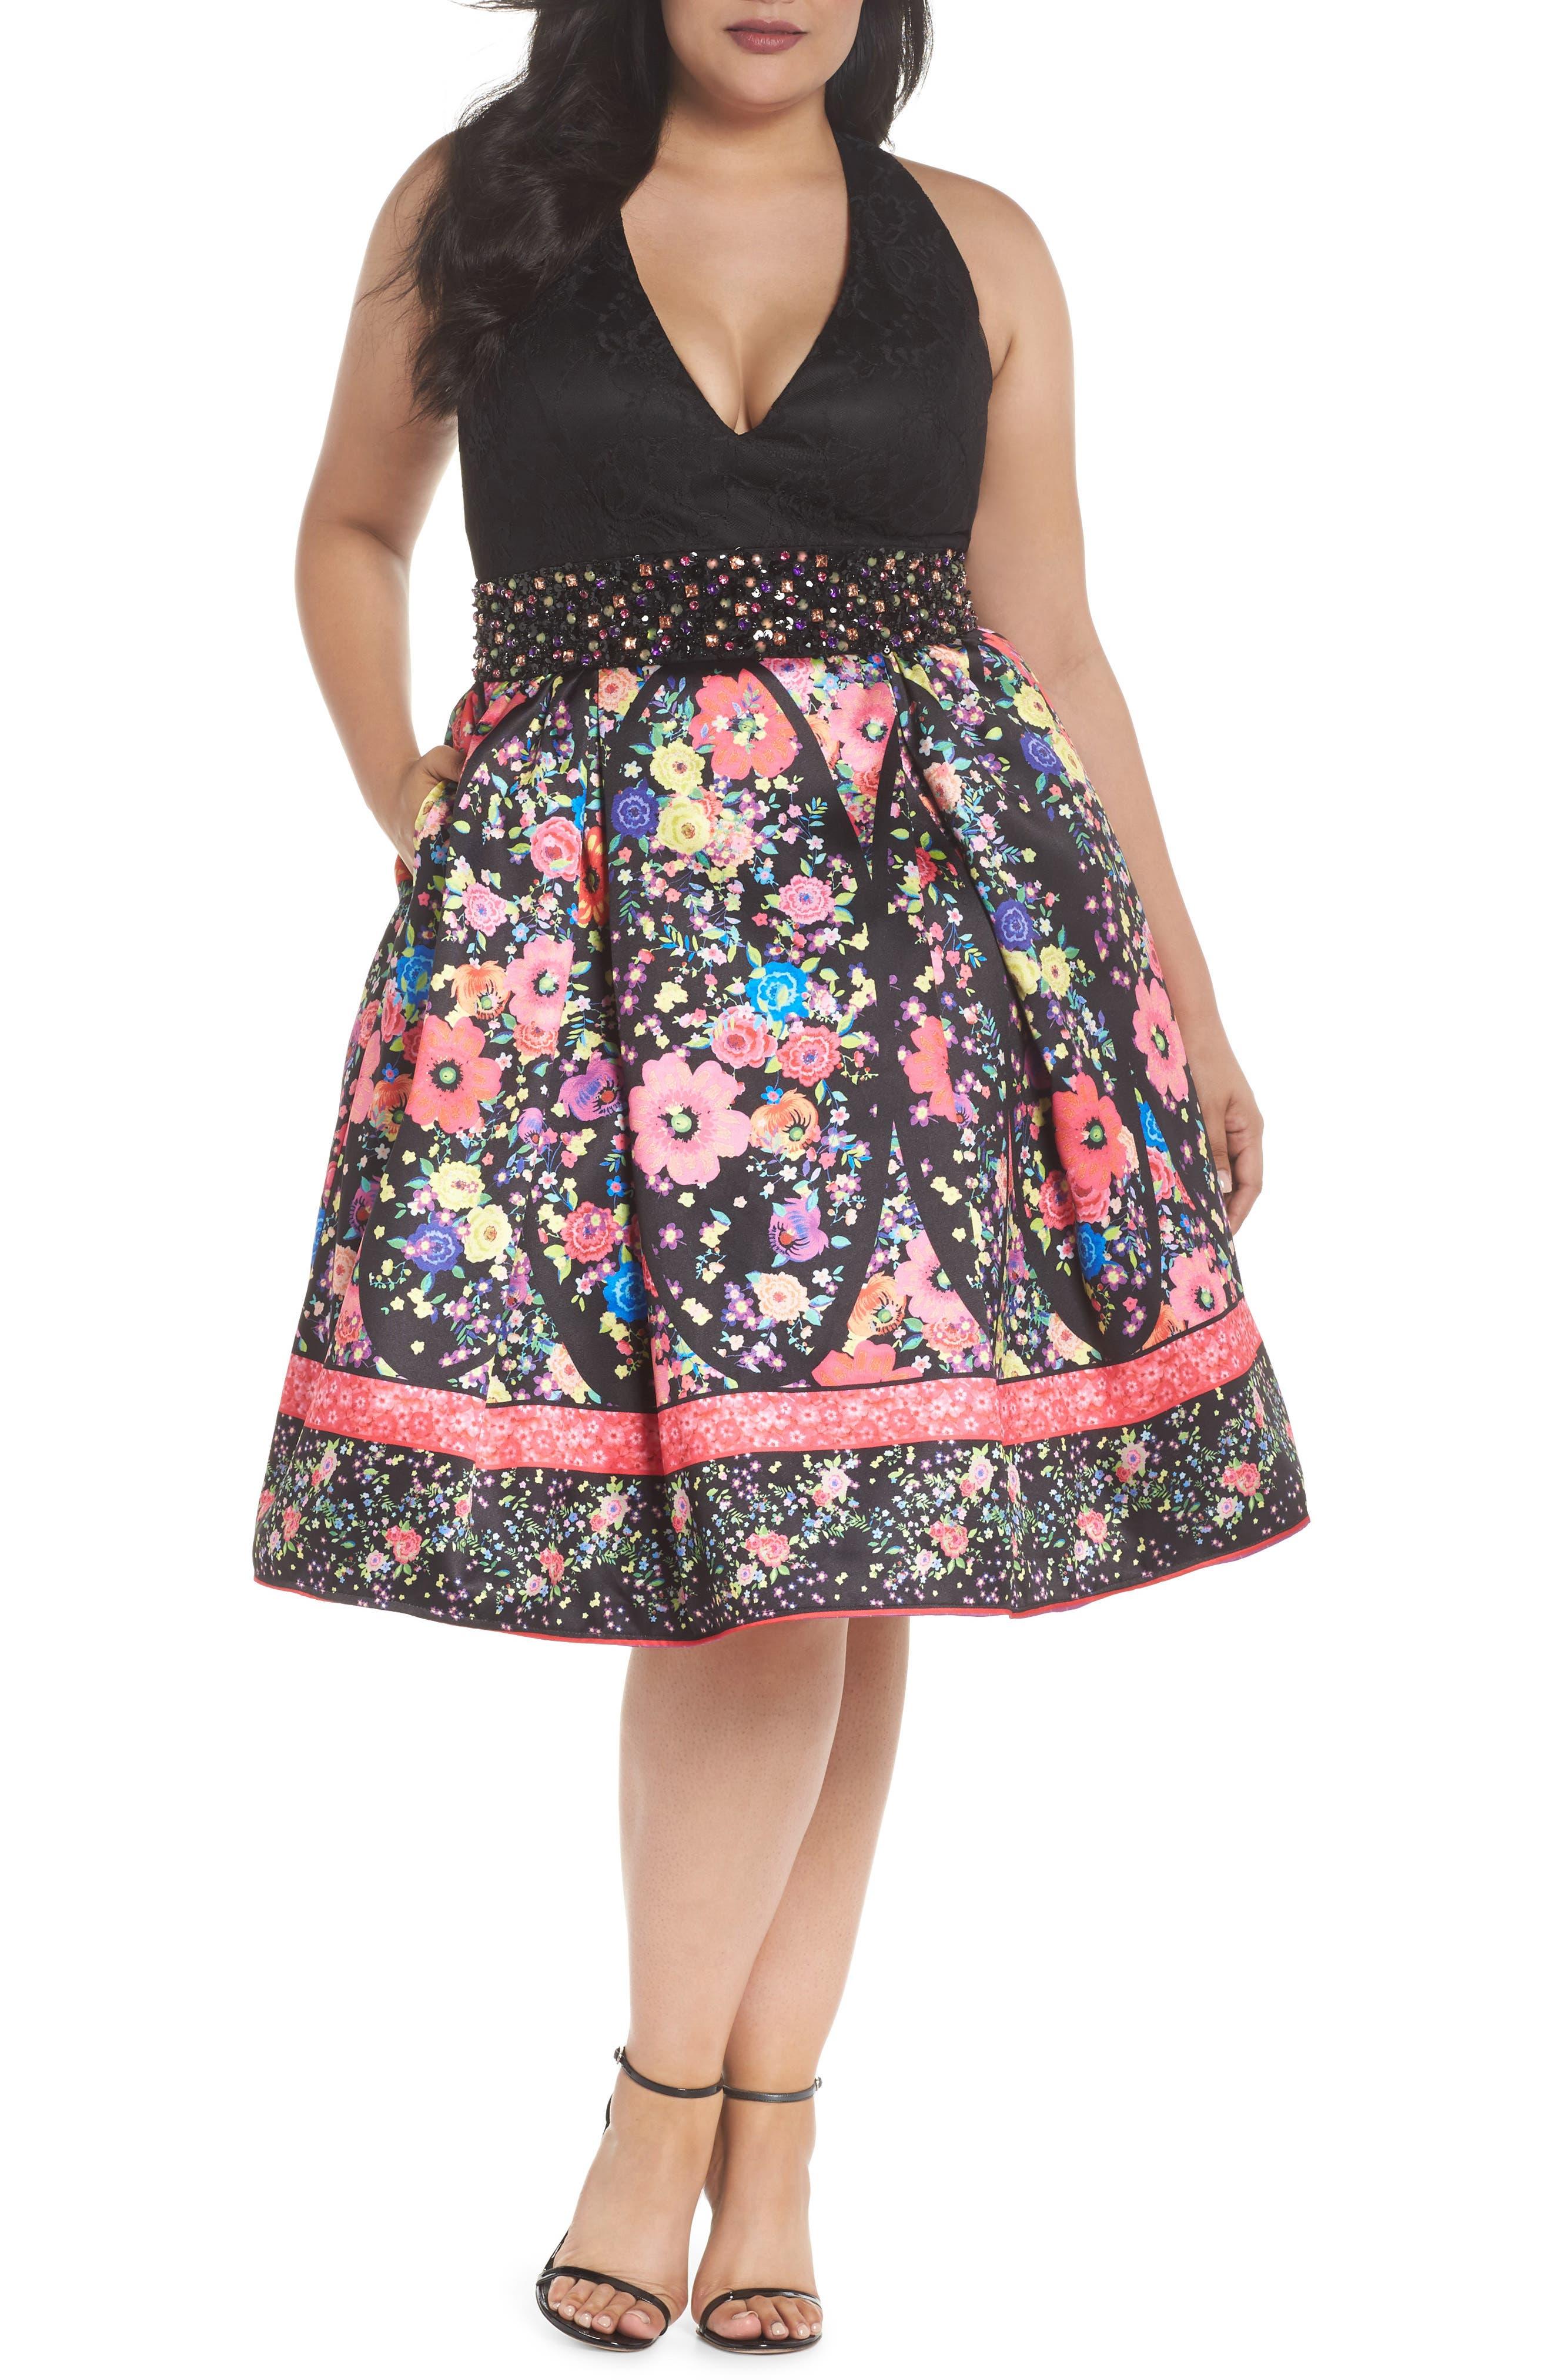 Lace & Floral Halter Fit & Flare Dress,                         Main,                         color, Black/ Multi